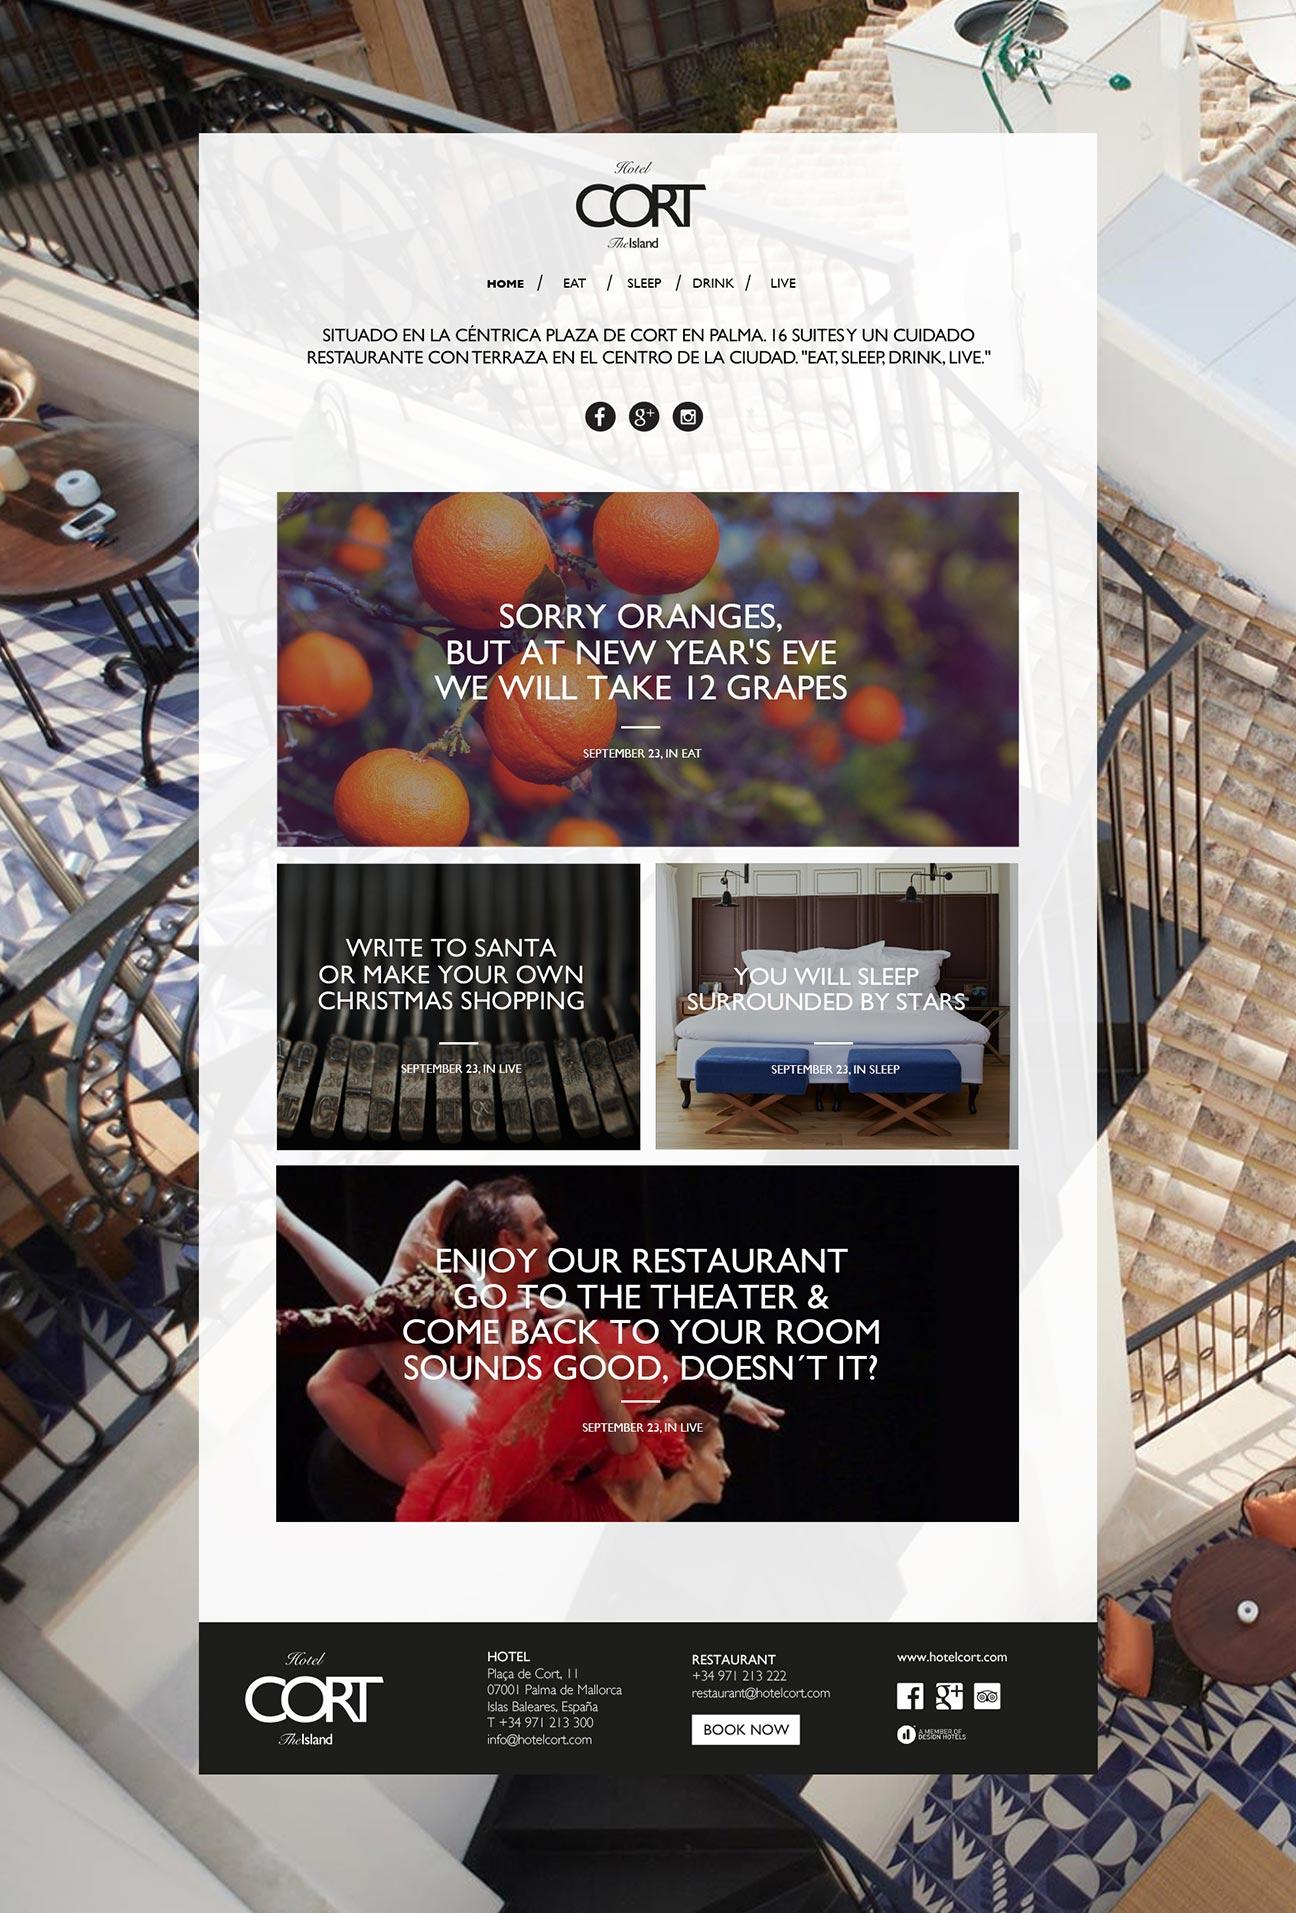 Hotel Cort - Blog